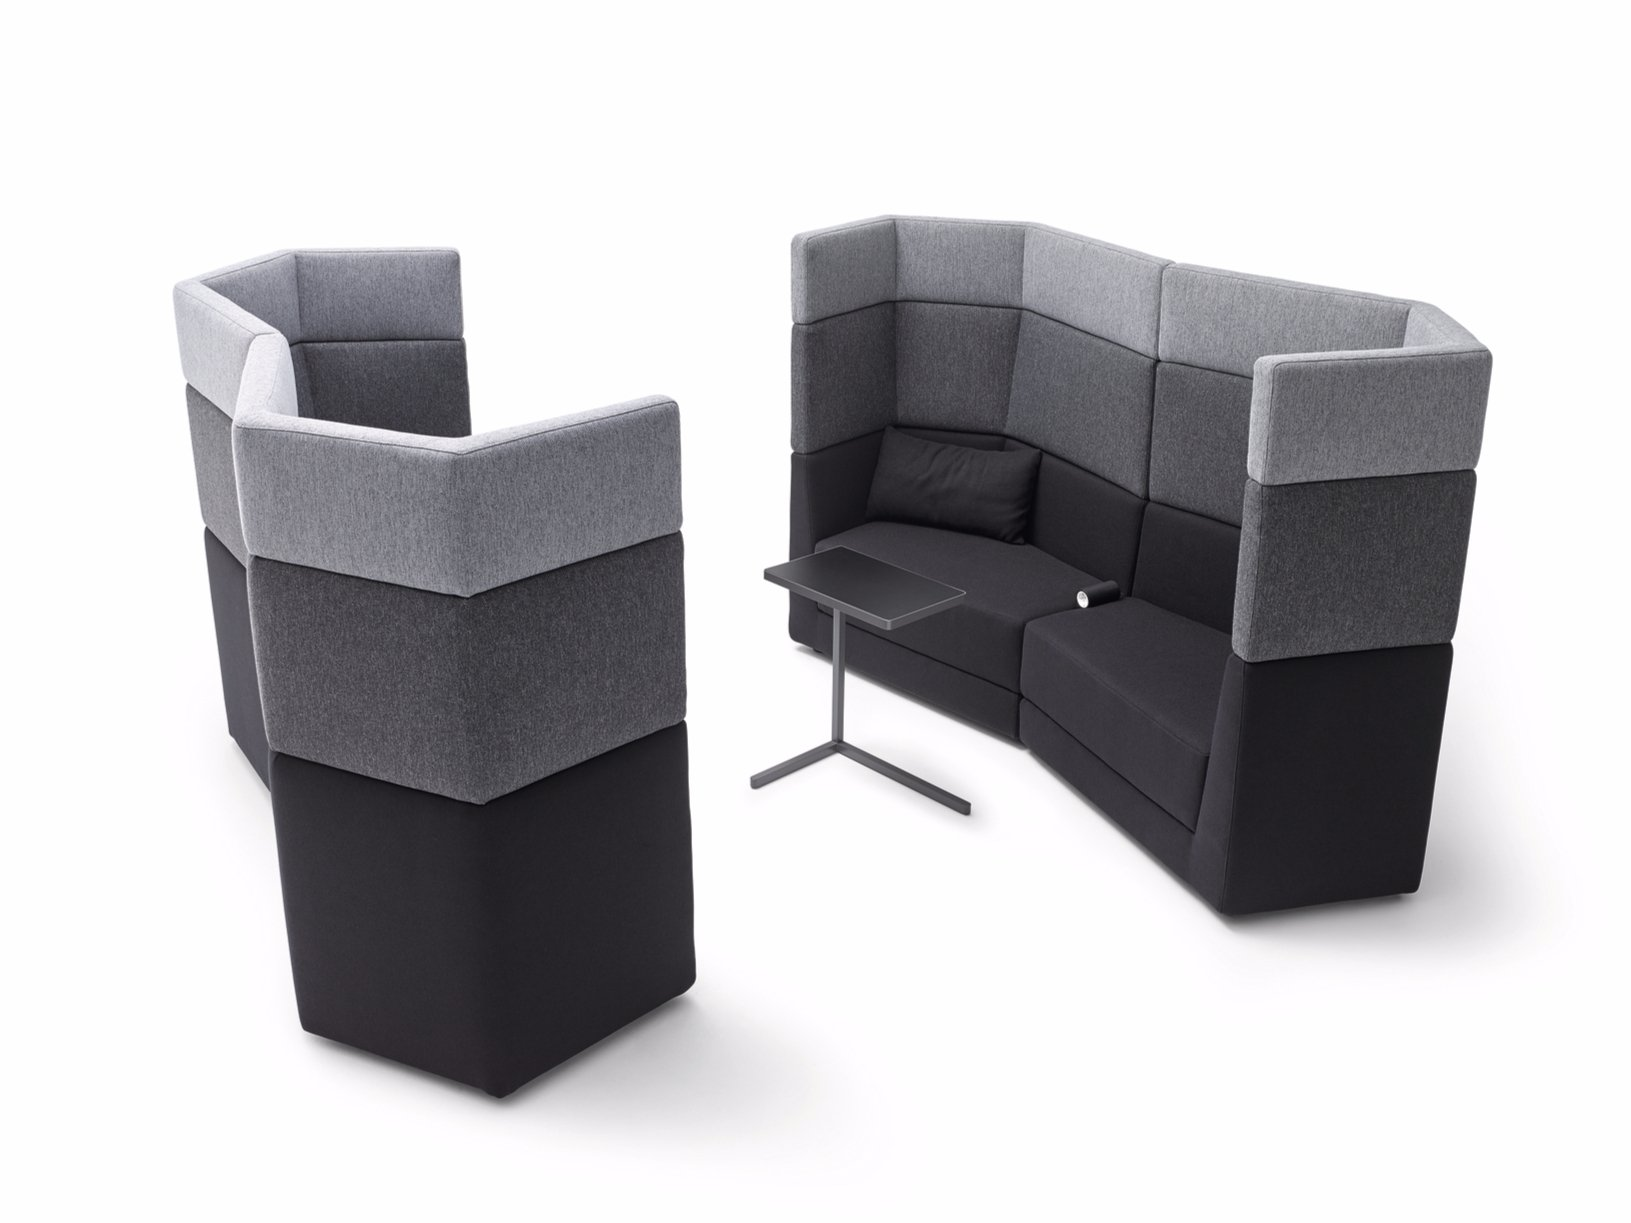 sofa aus stoff mit hoher r ckenlehne kollektion scope by. Black Bedroom Furniture Sets. Home Design Ideas